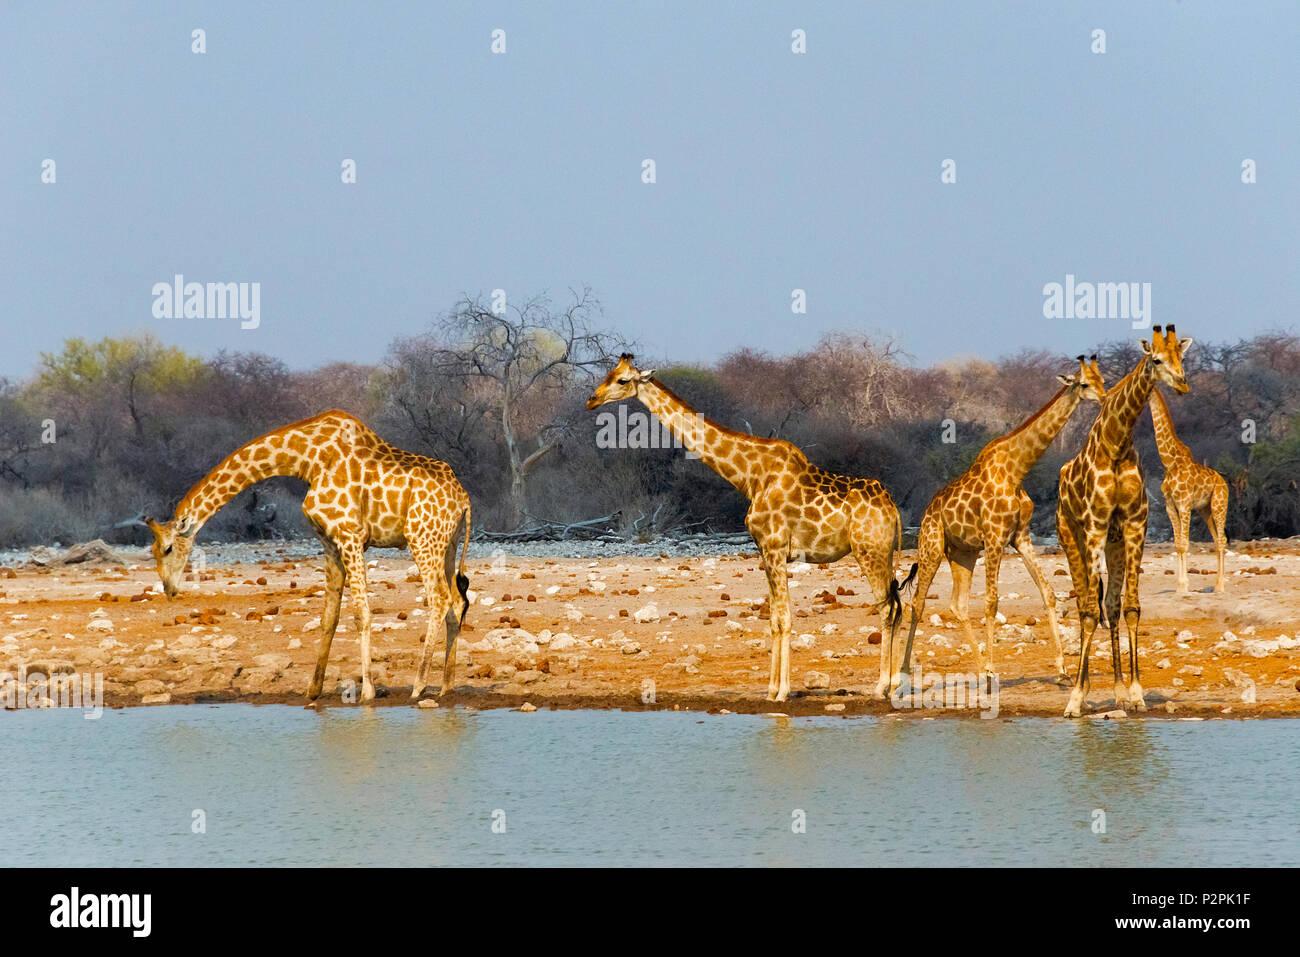 Giraffes by the river, Etosha National Park, Oshikoto Region, Namibia - Stock Image